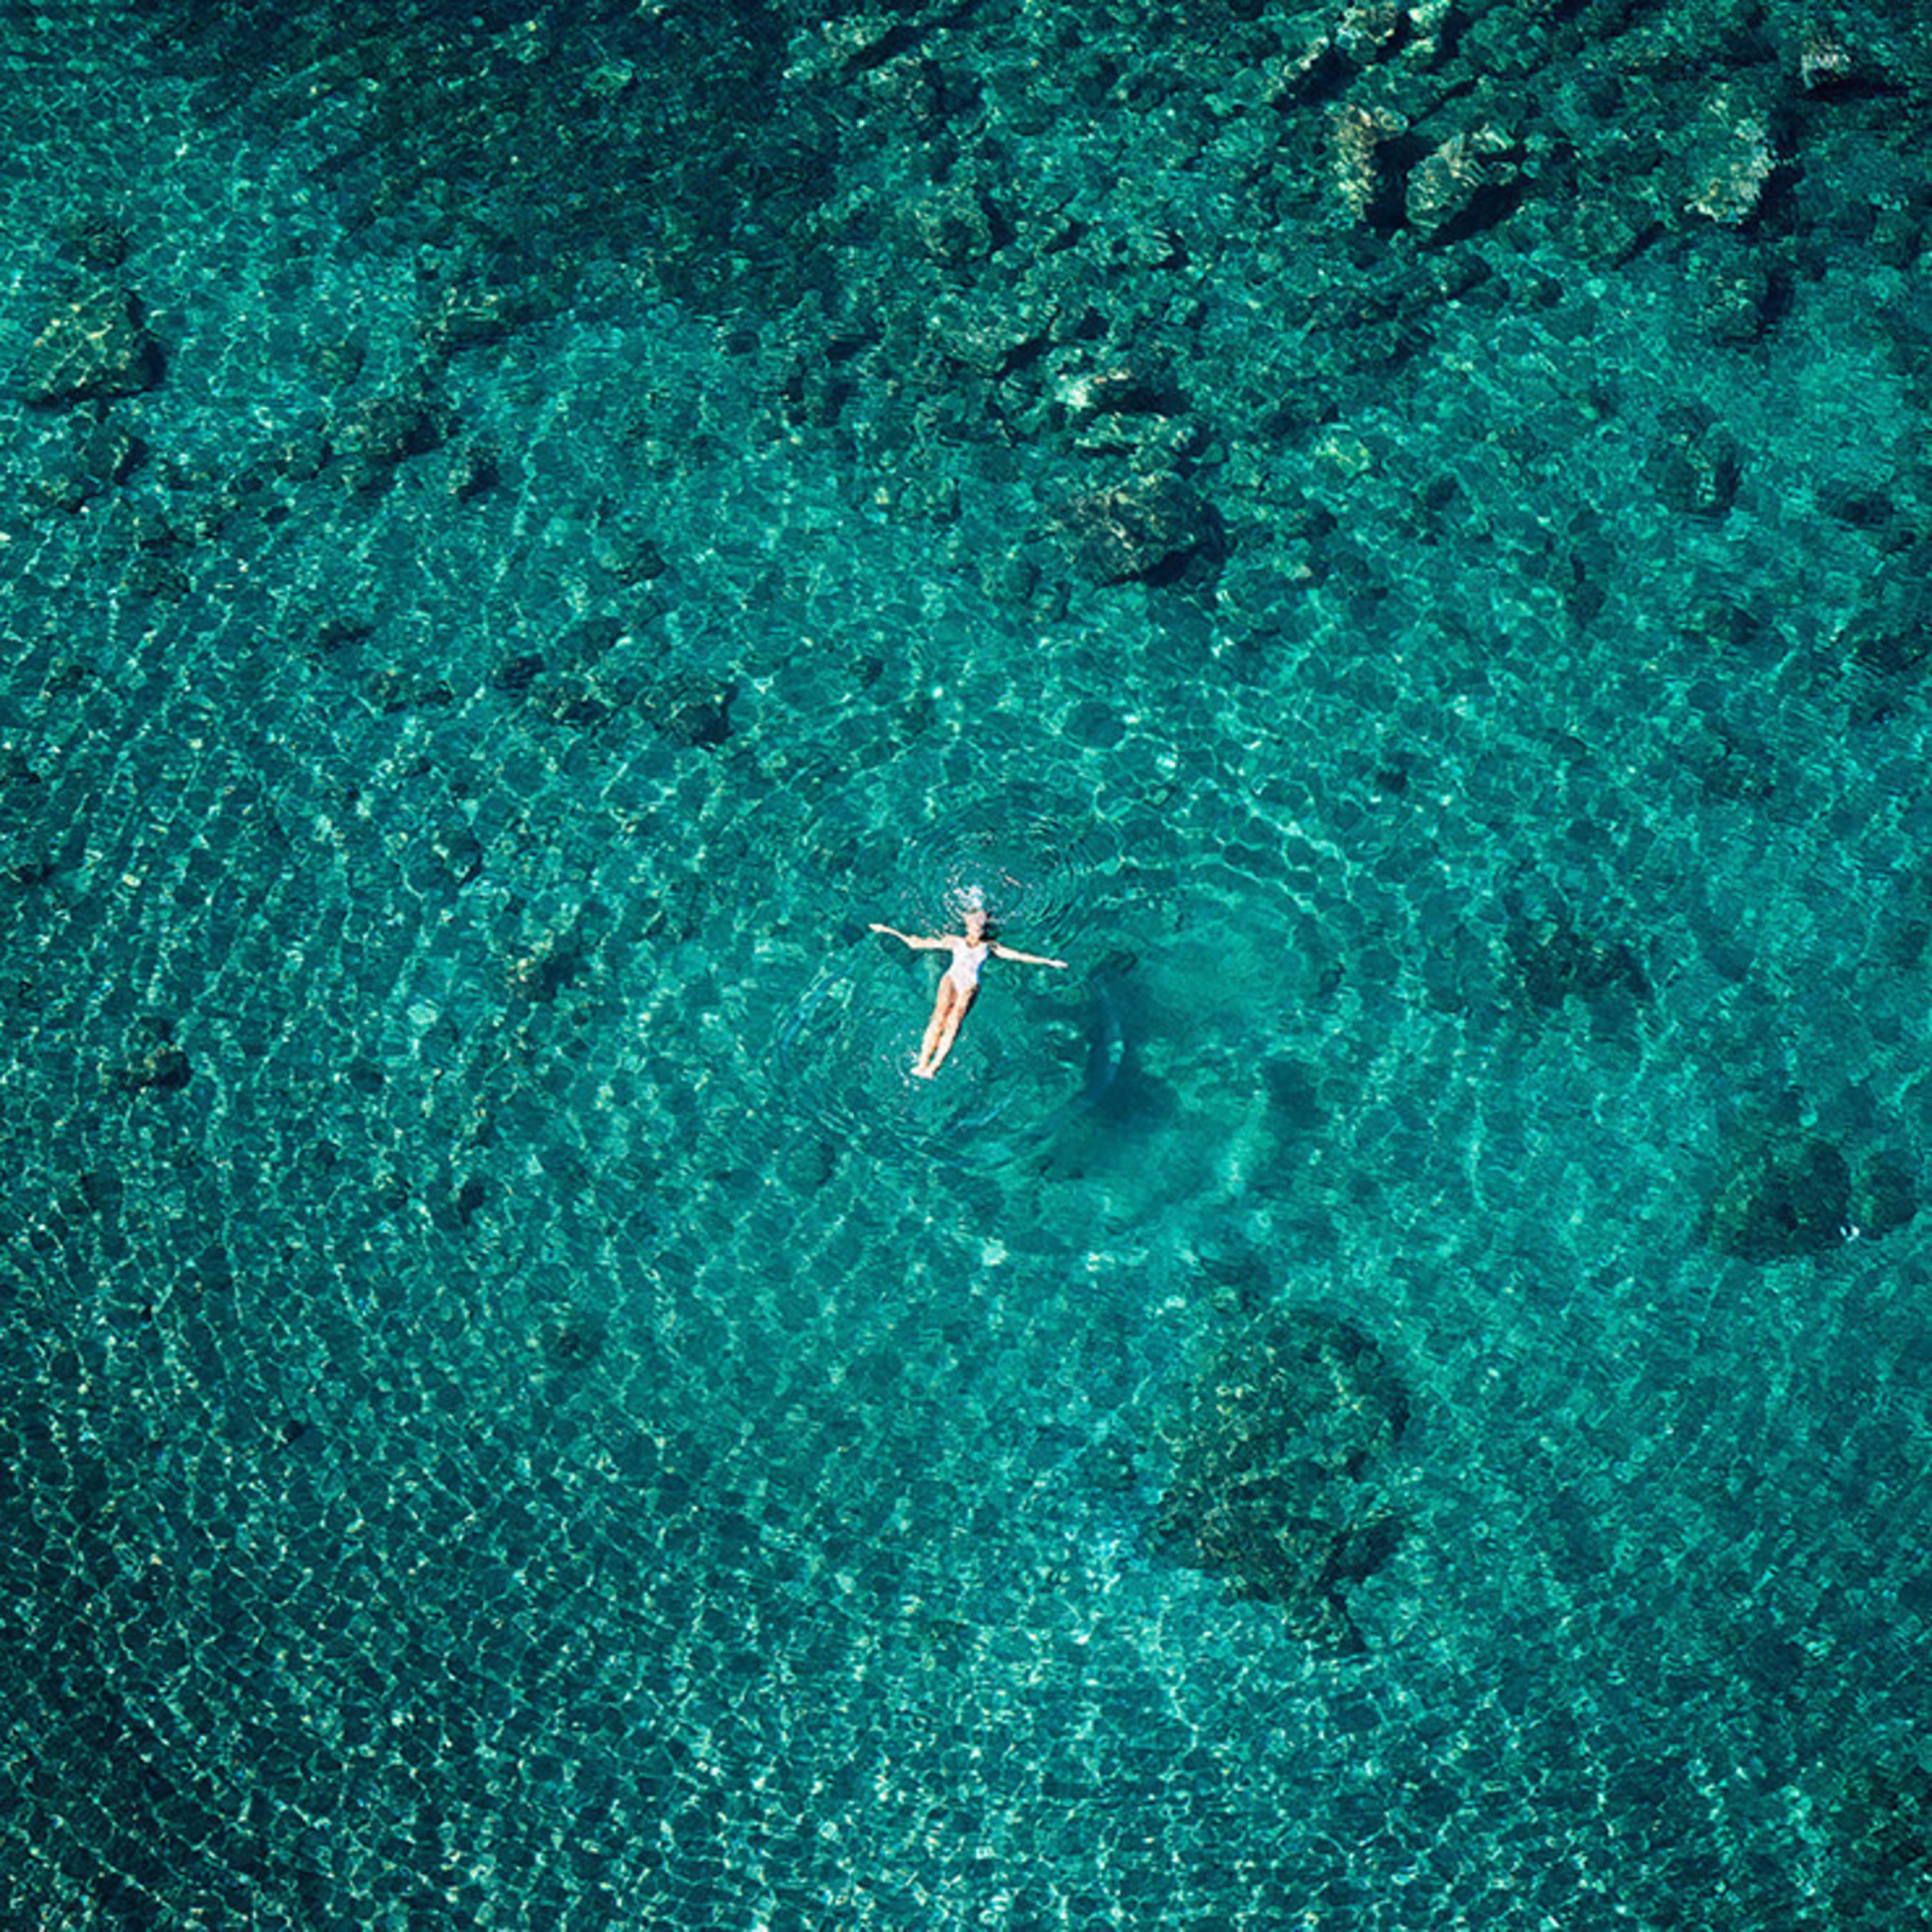 David Drebin (B. 1966 - ) Floating Dreams, 2016, Lightbox, 60 x 60 inches